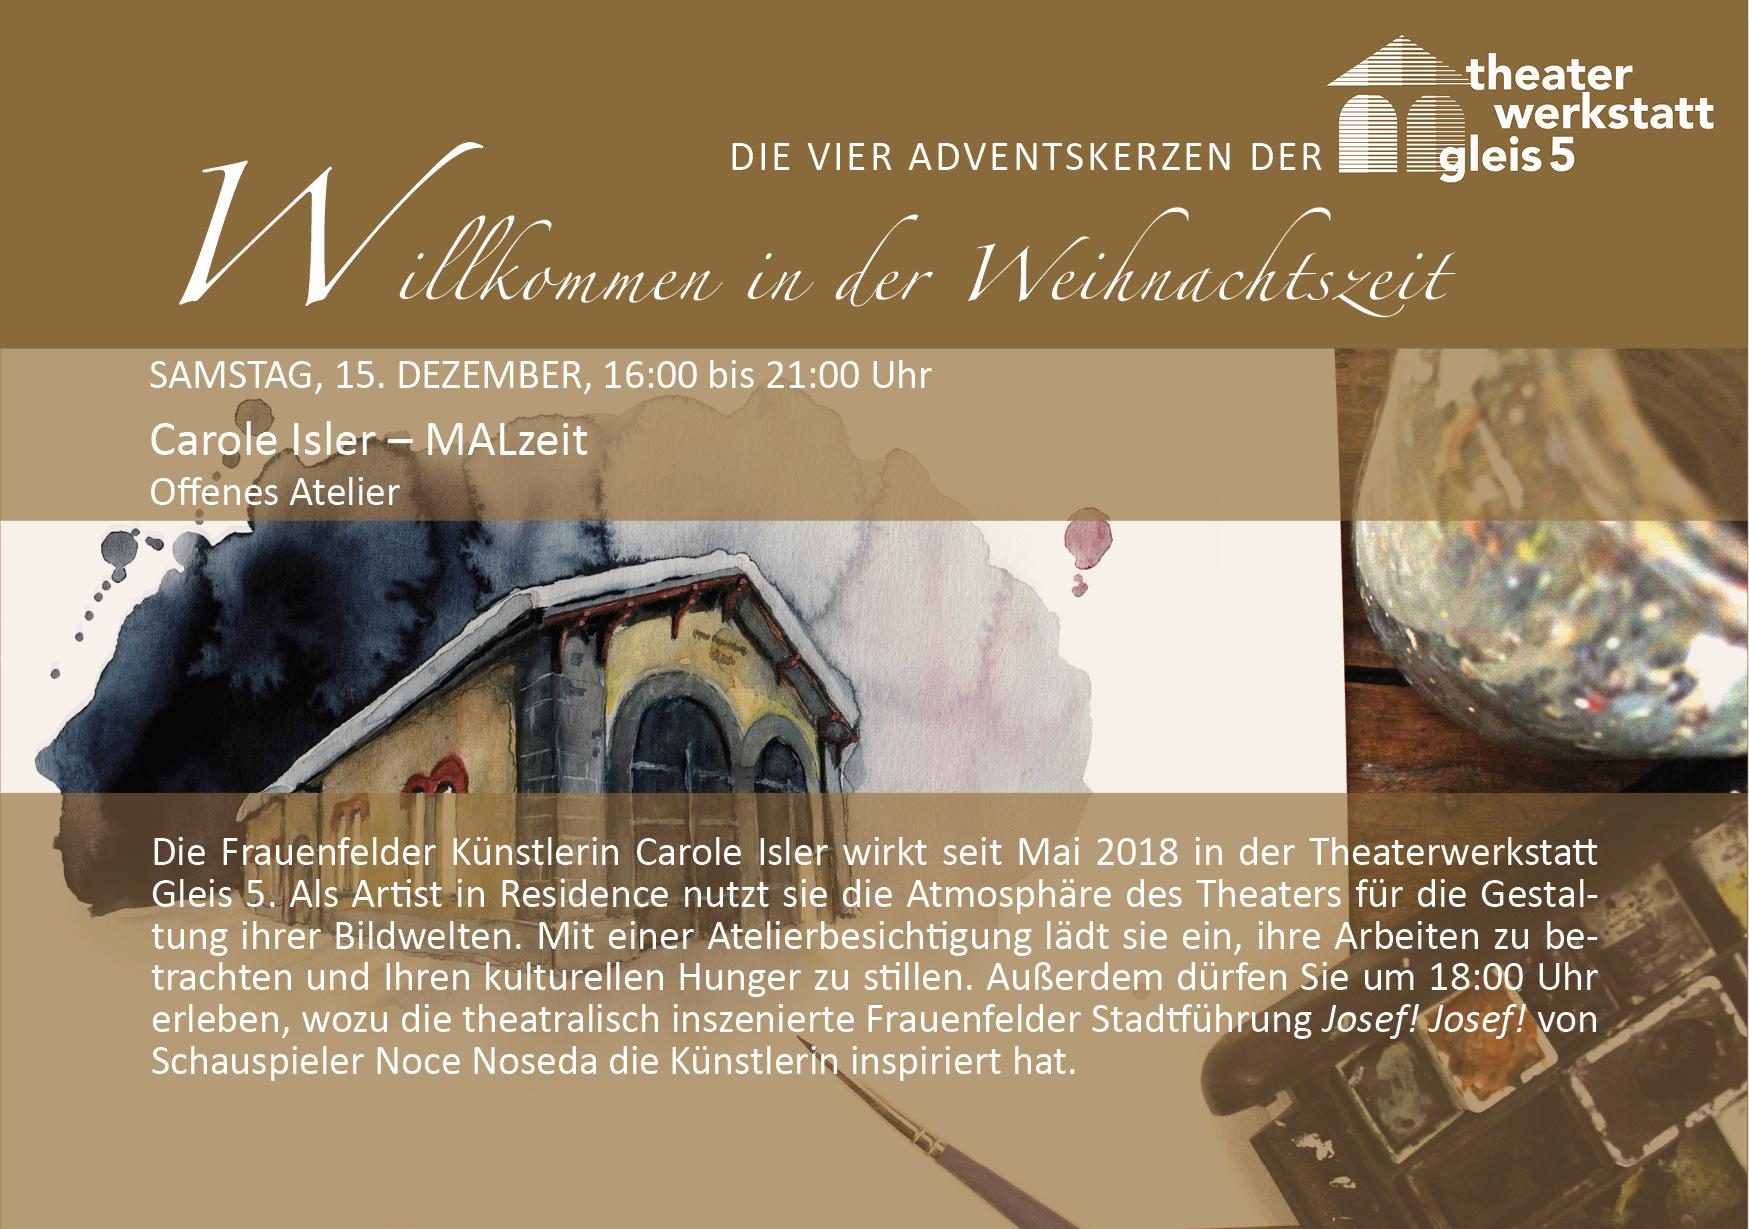 www.theaterwerkstatt.ch